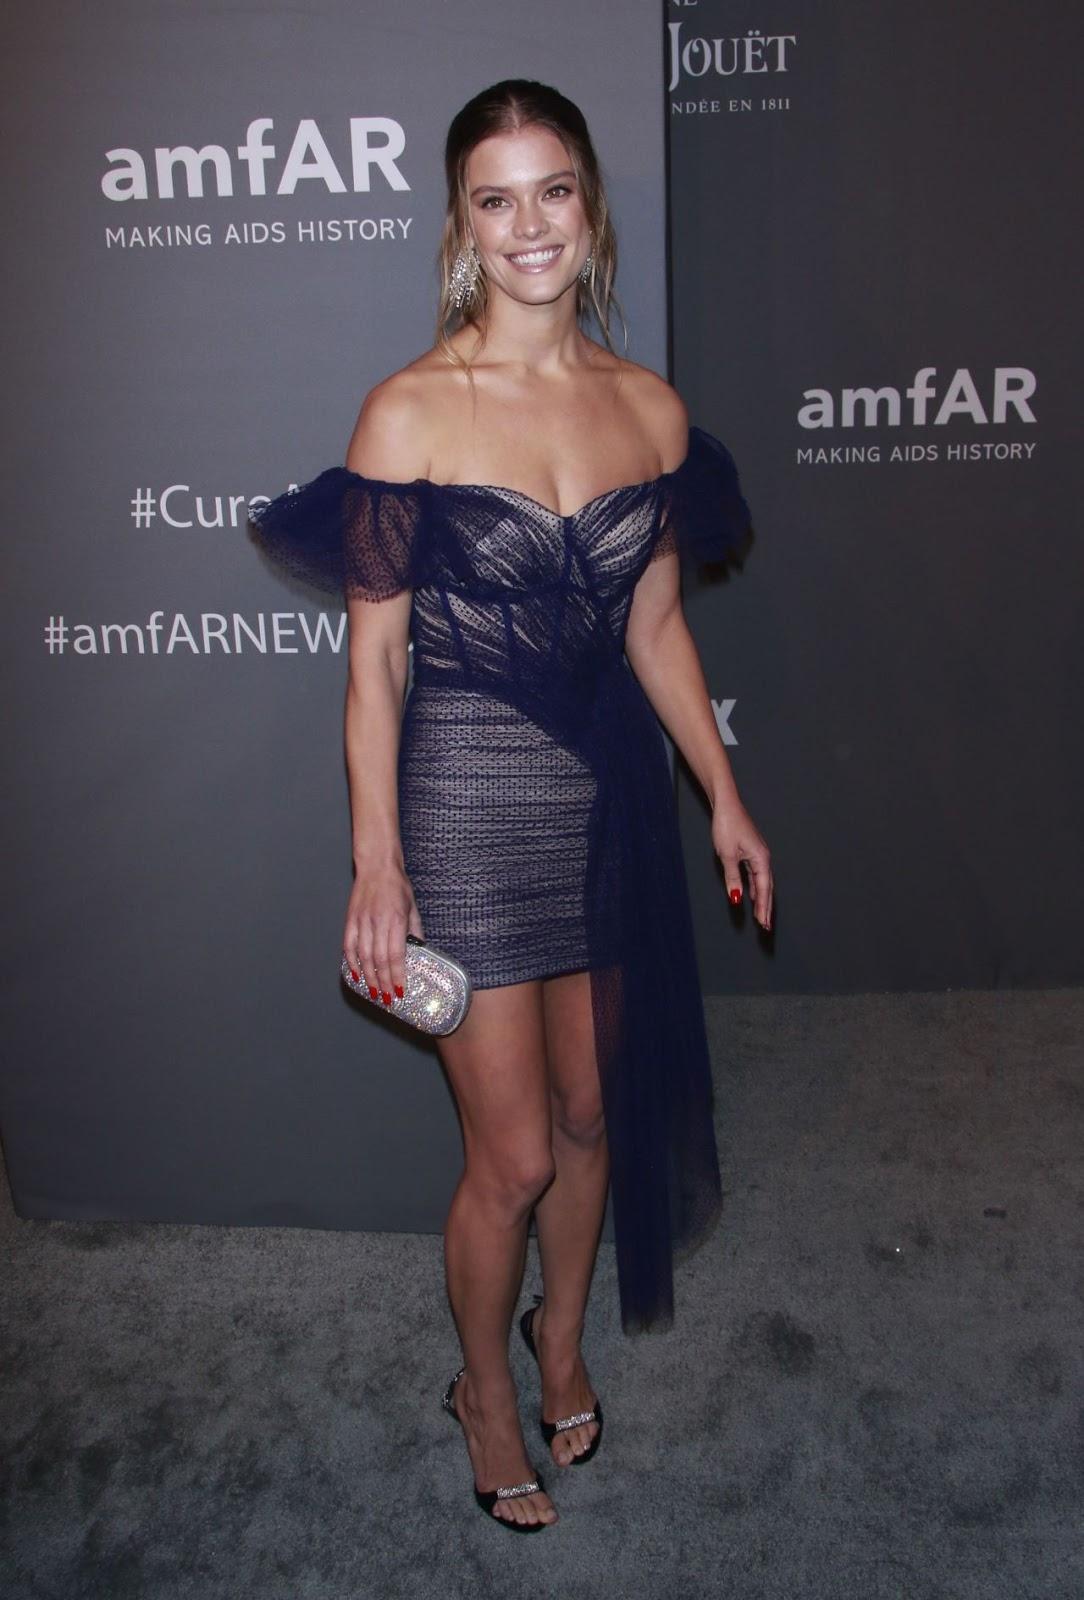 Nina Agdal - amfAR New York Gala in NYC - 02/06/2019